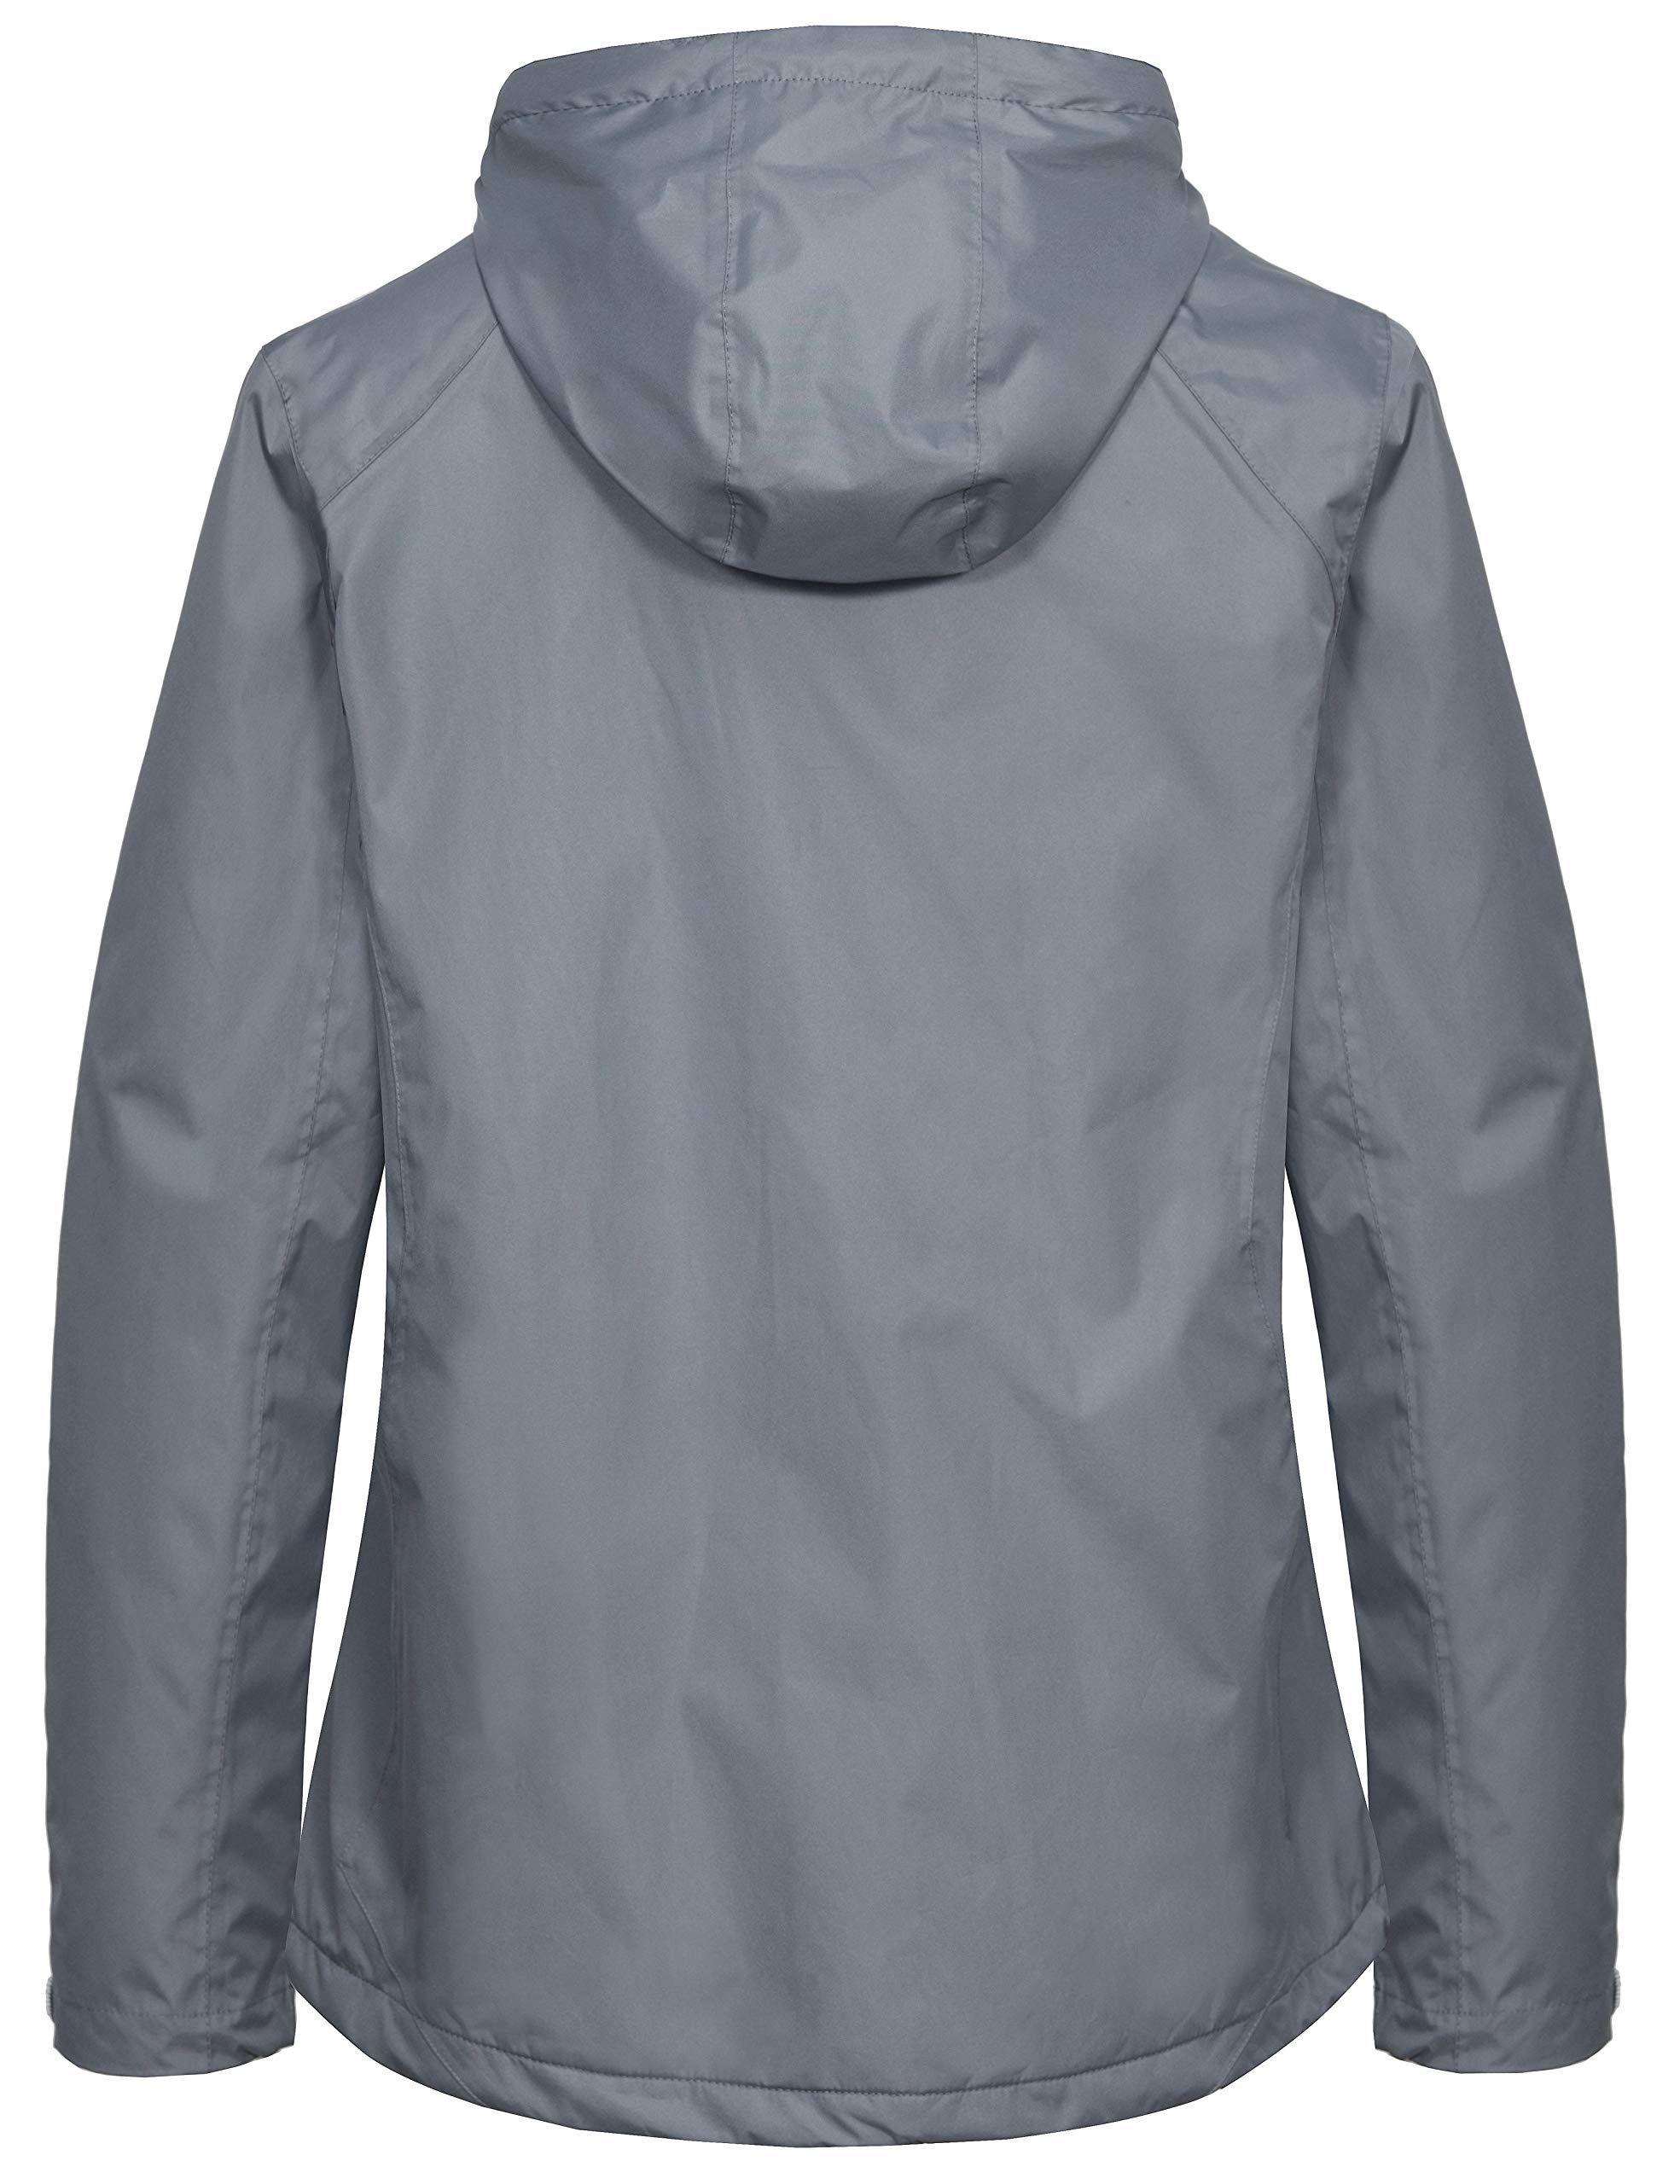 Little Donkey Andy Women S Hooded Anorak Pullover Raincoat Packable Rain Jacket With Fleece Lining Waterproof Packable Rain Jacket Anorak Classy Jumpsuit [ 2560 x 1969 Pixel ]